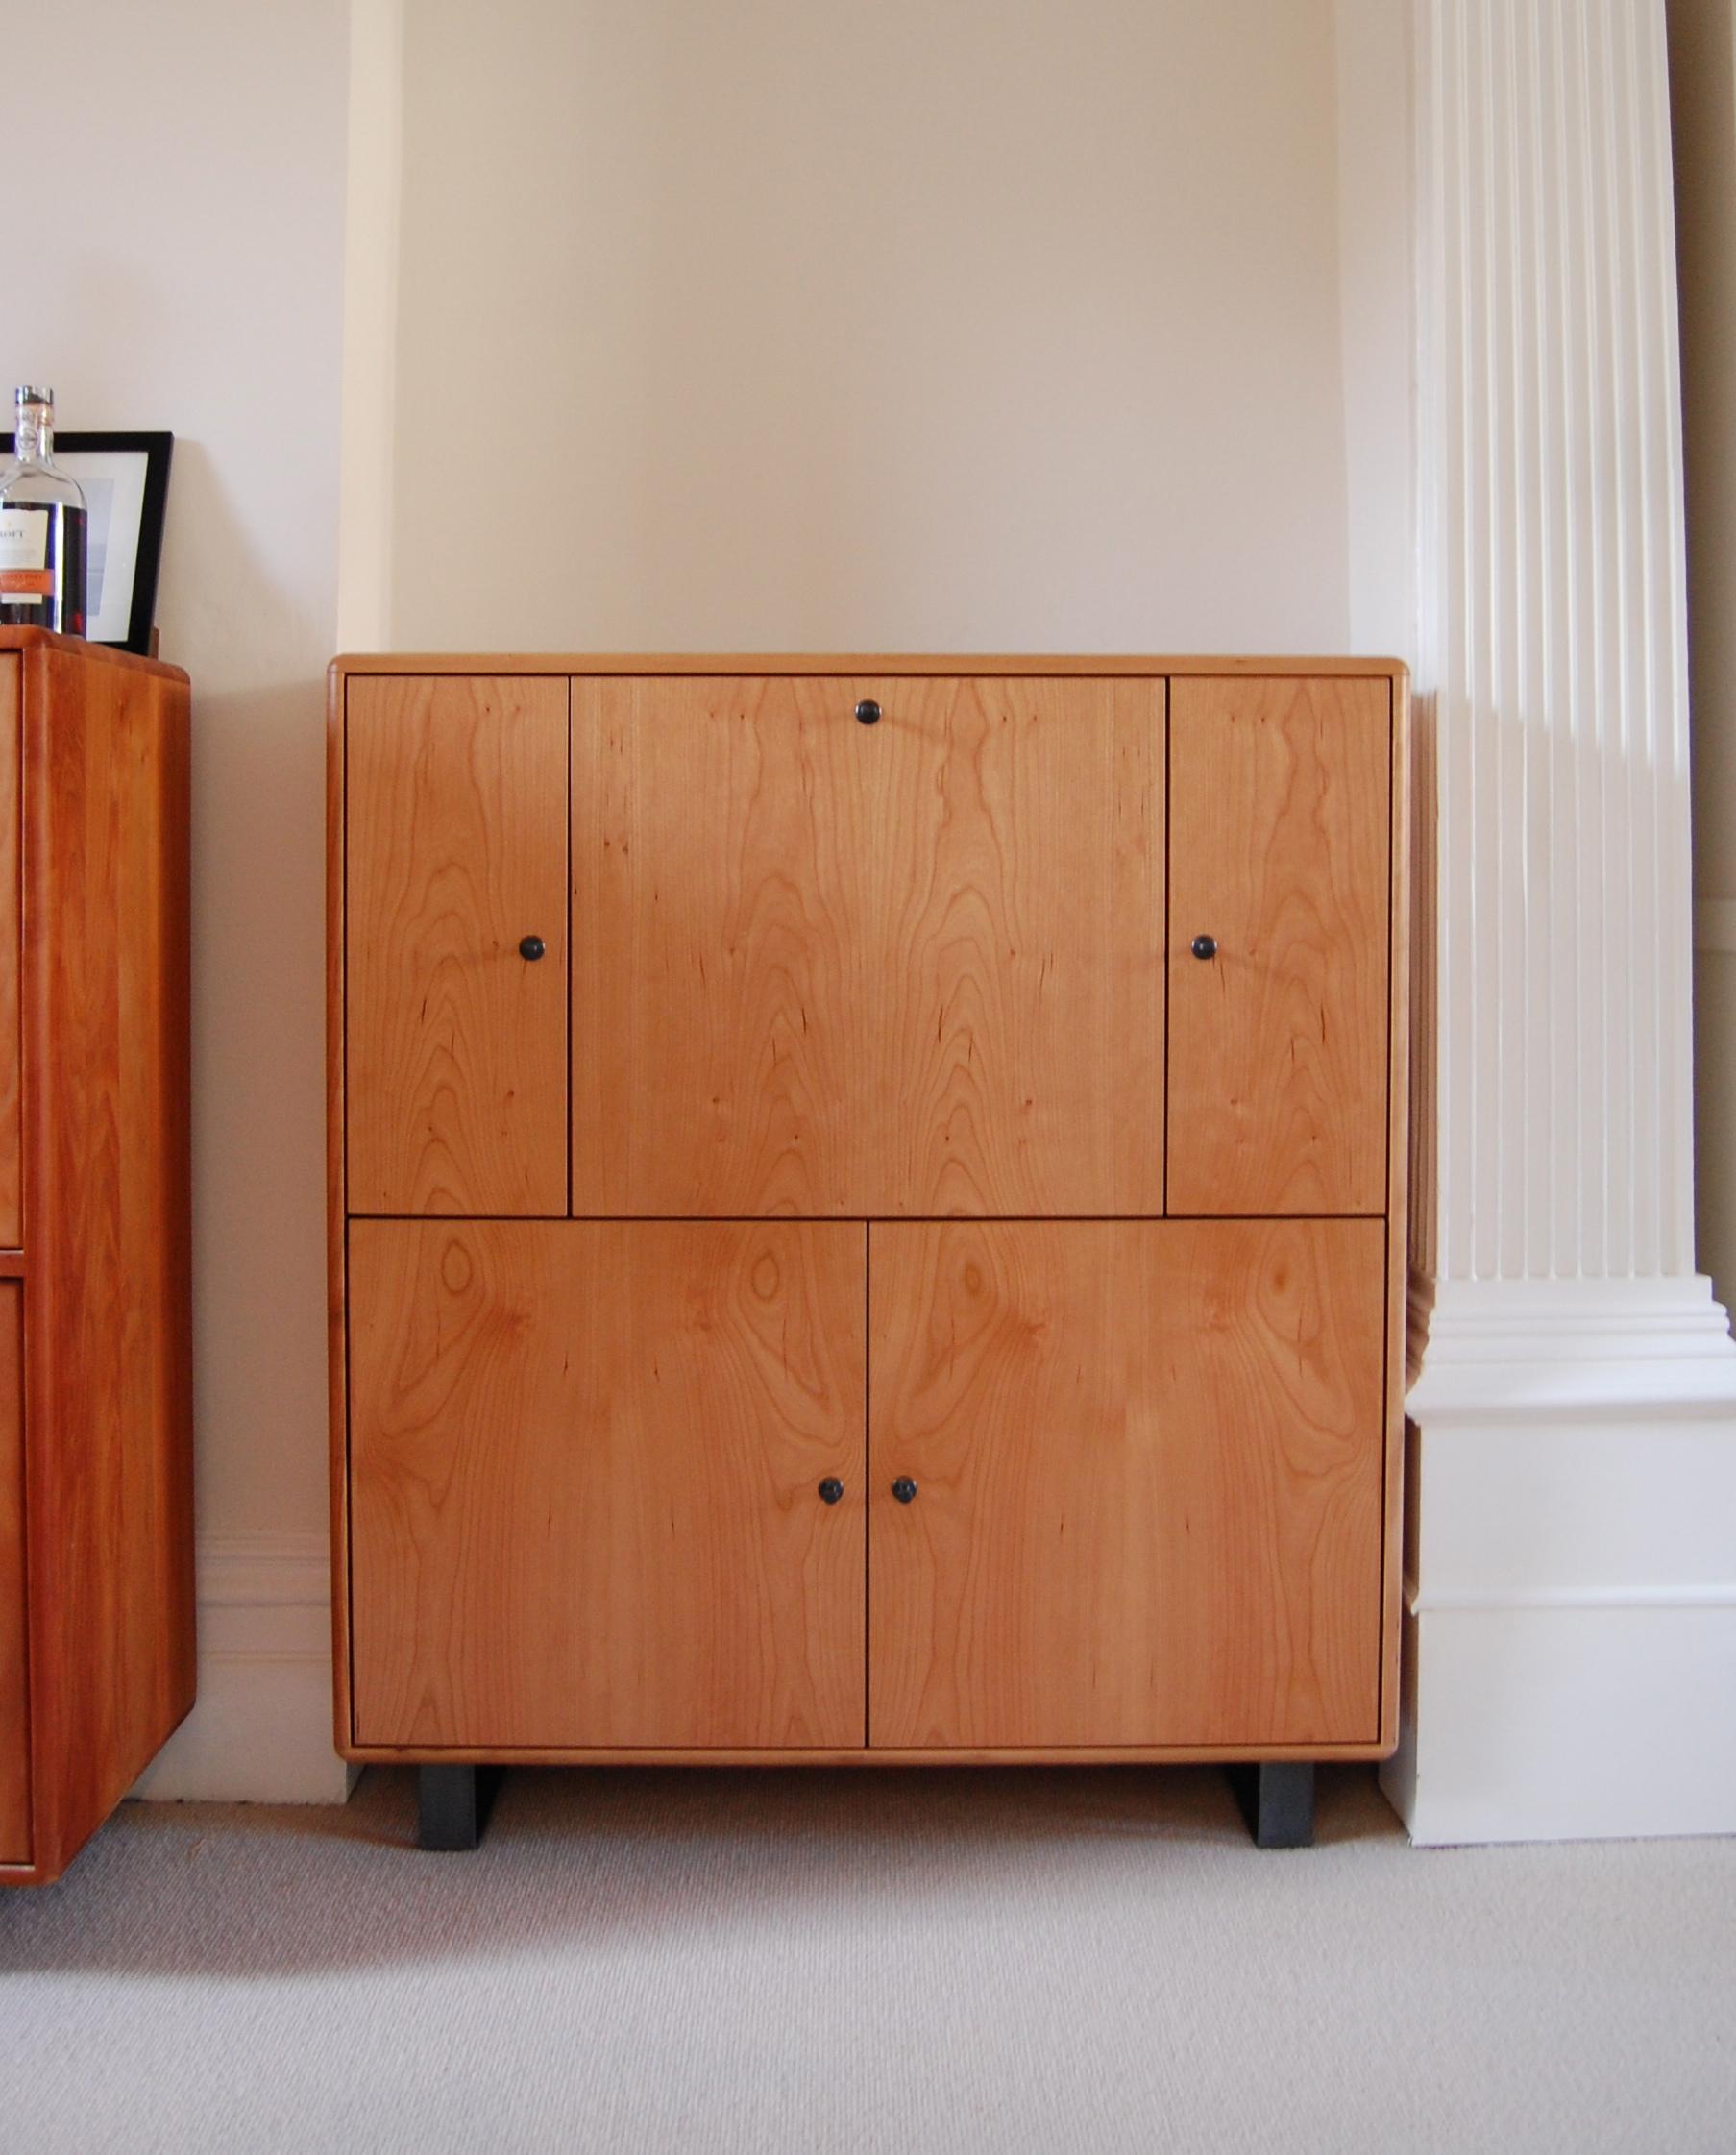 Grain_Bespoke_Furniture_Cherry_Drinks_Cabinet.jpg